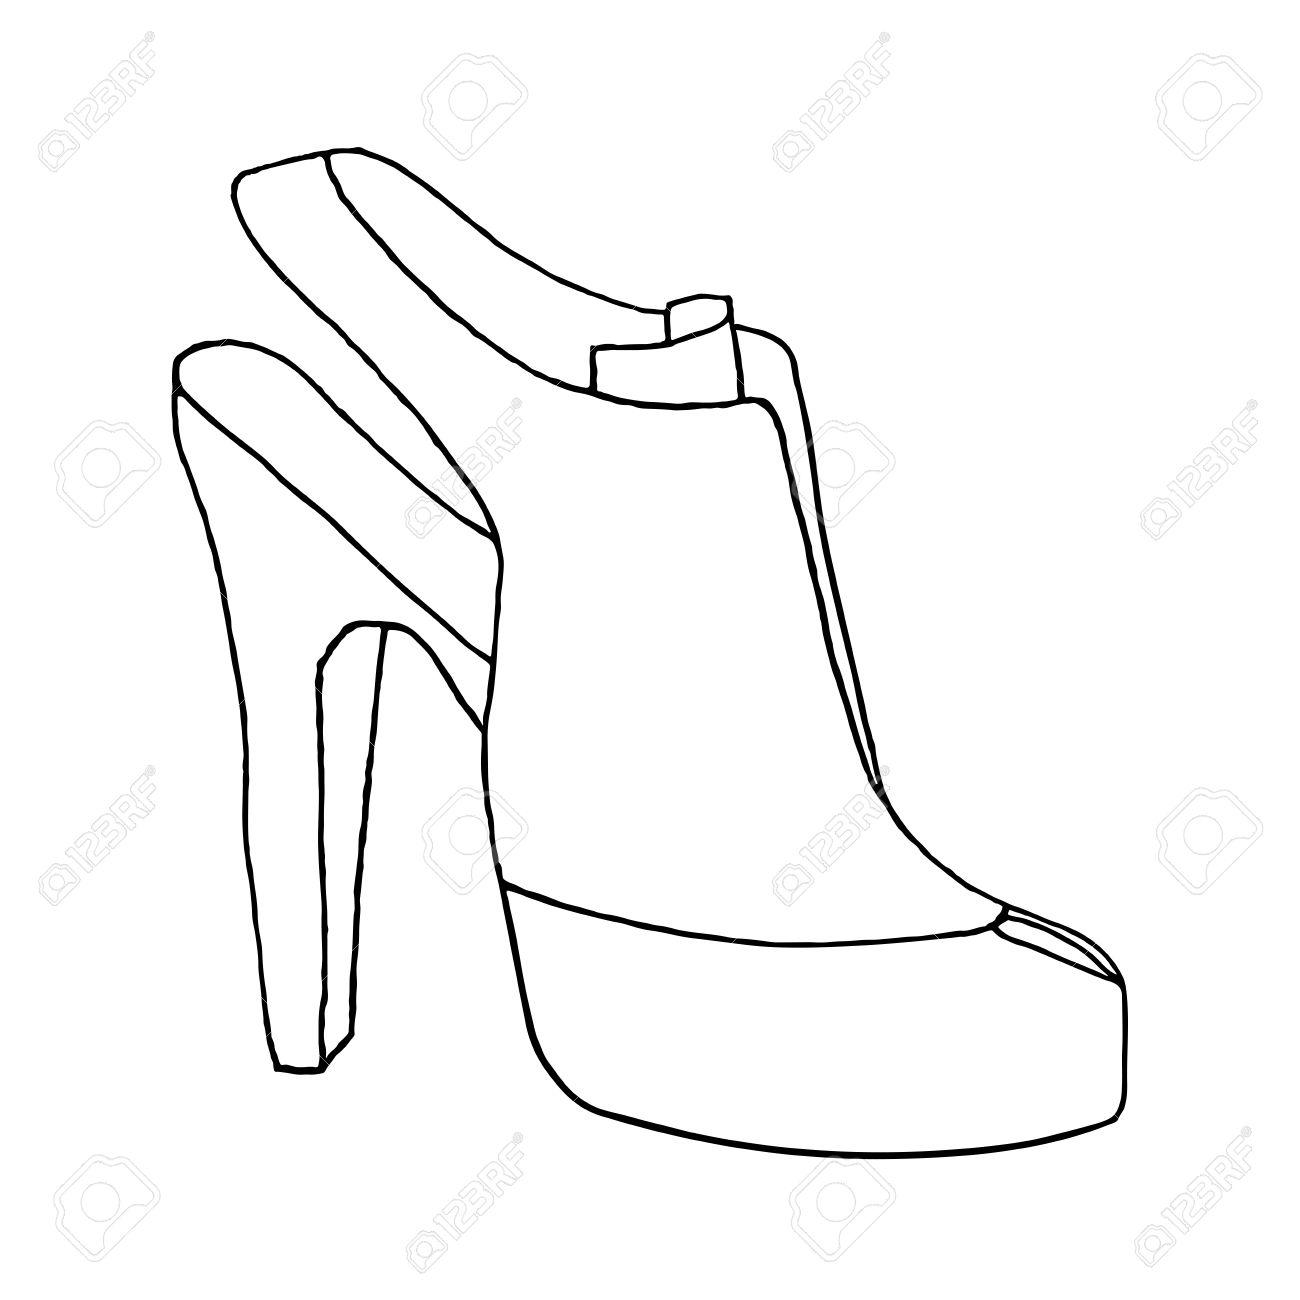 1300x1300 High Heel Woman Shoe. Shoe With Stiletto Heel. Fashion